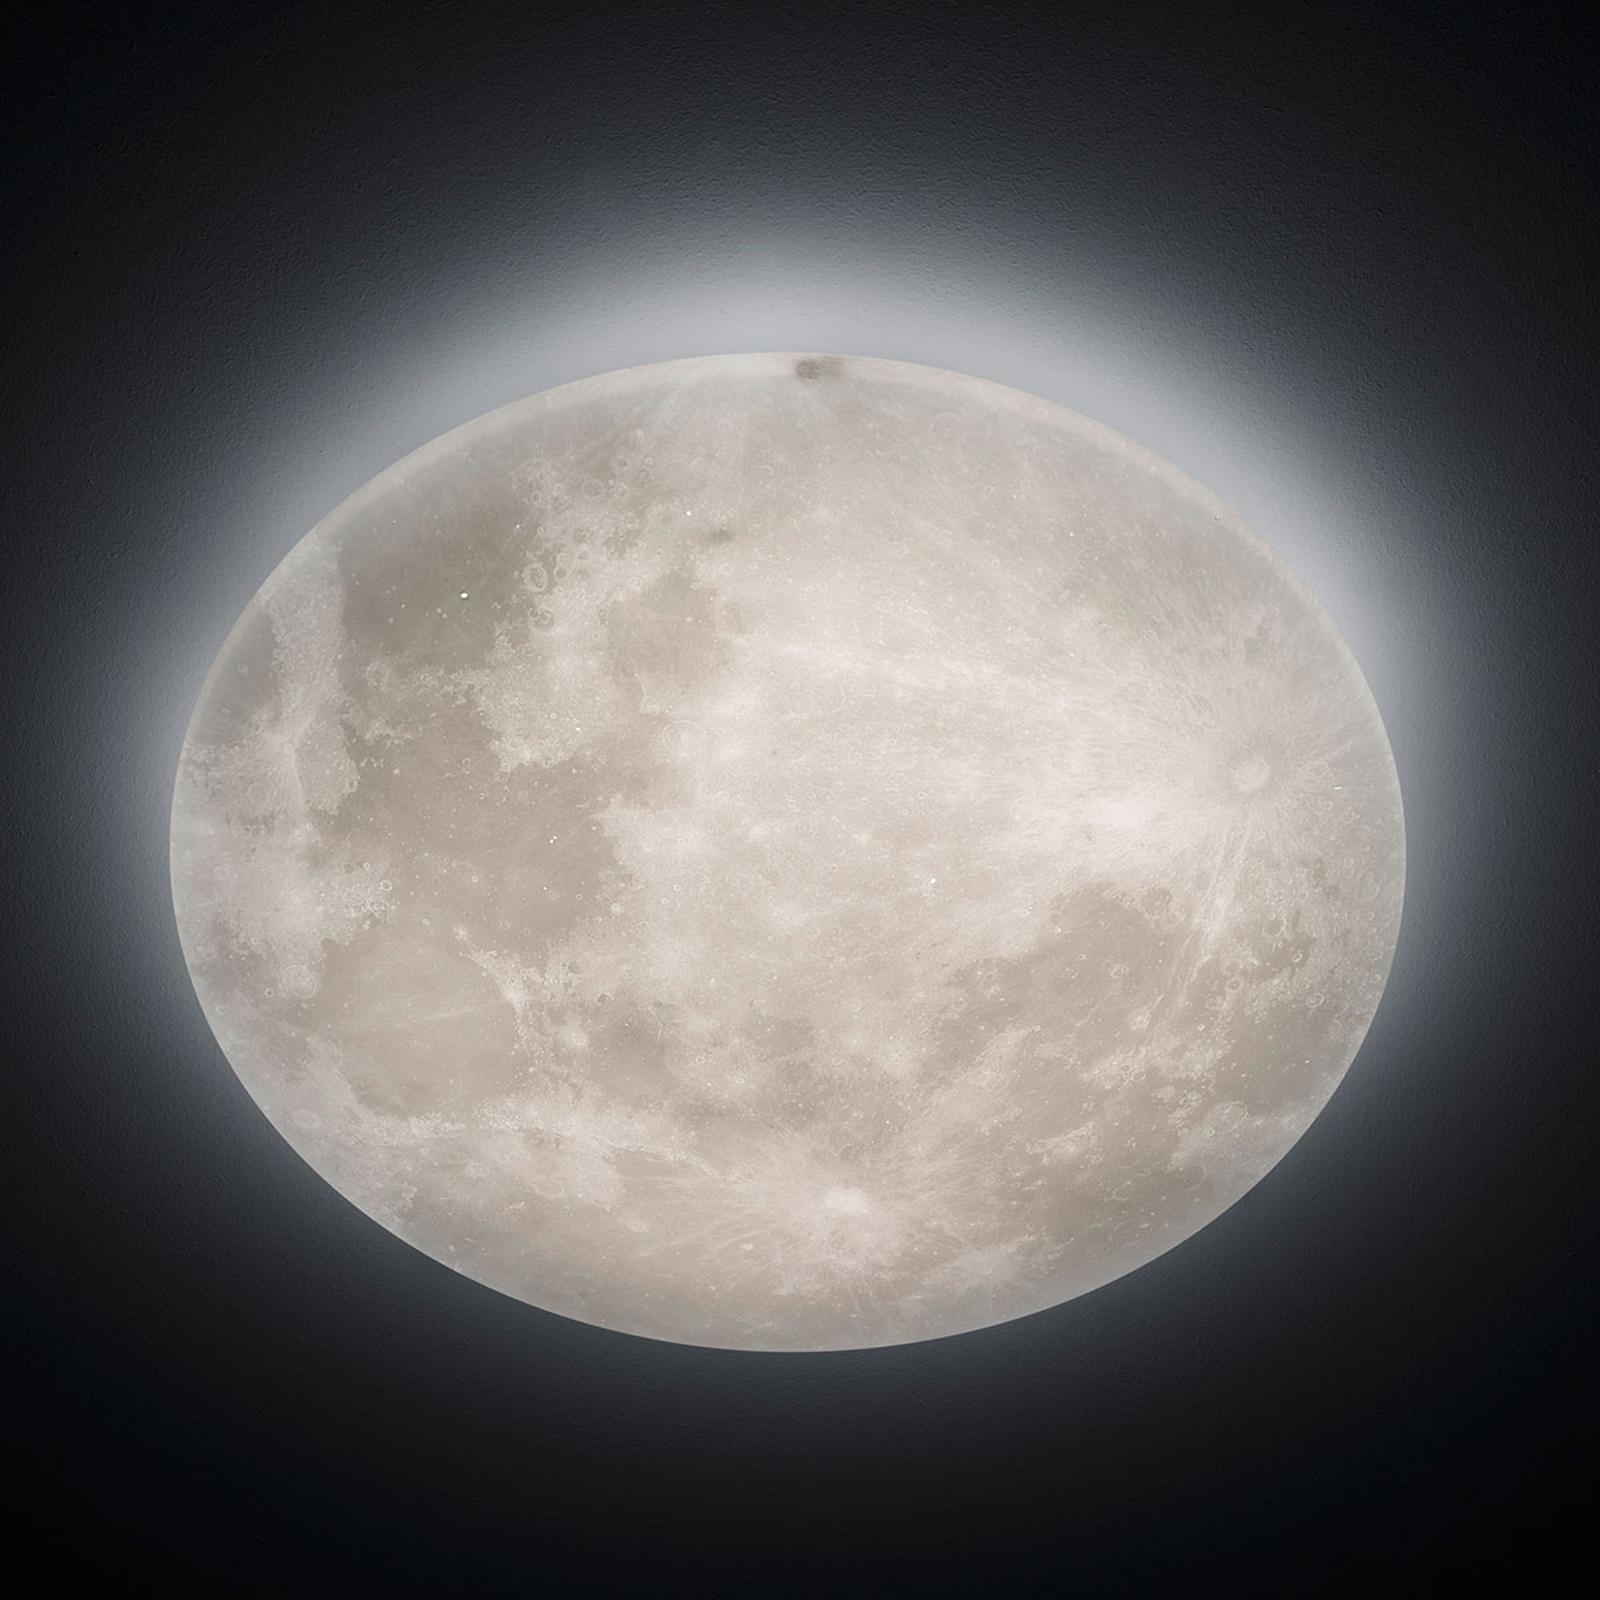 Lampa sufitowa LED Lunar, pilot, 60cm